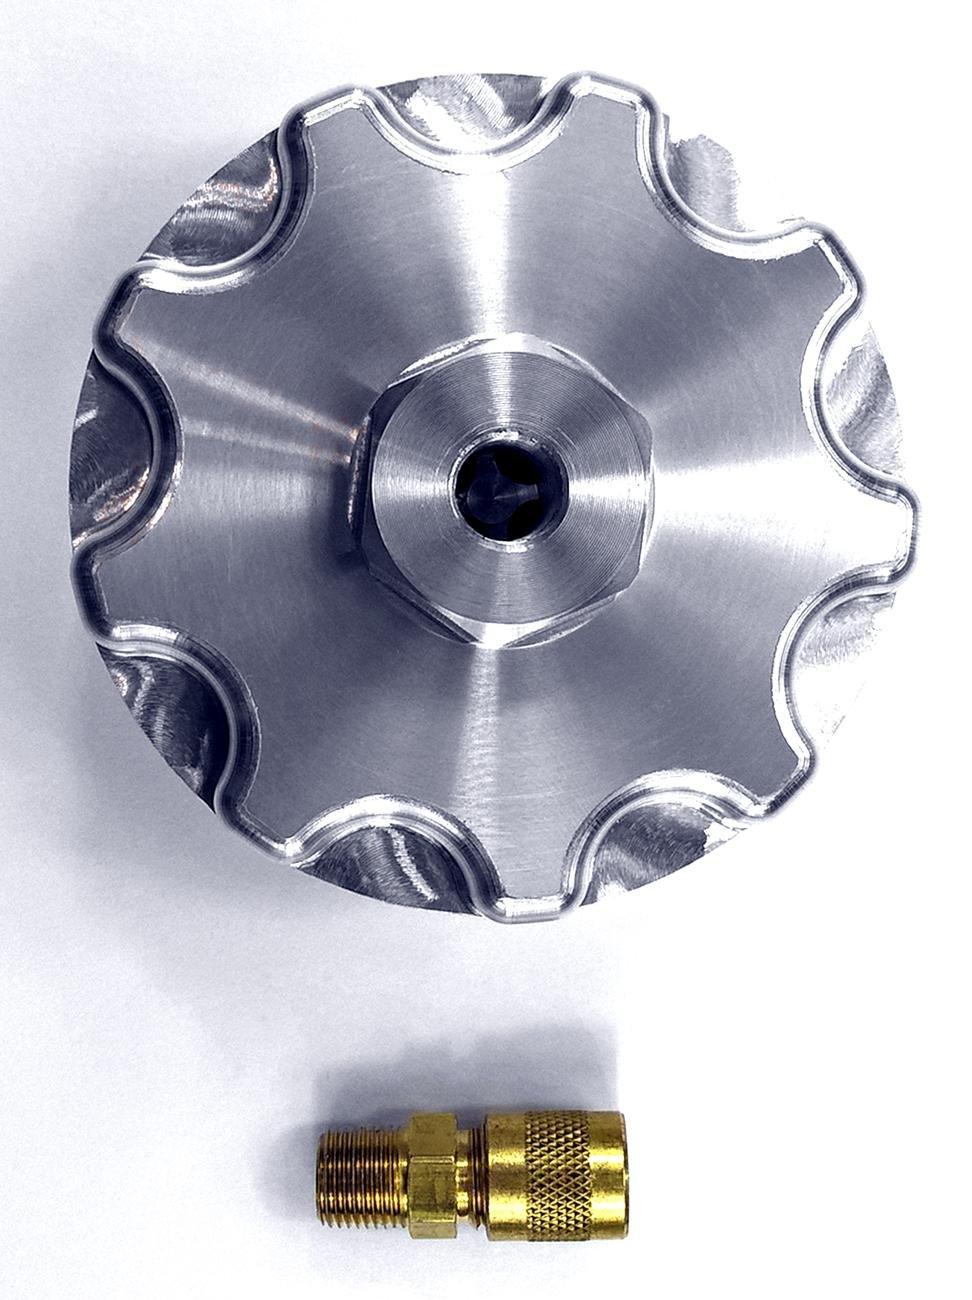 medium resolution of elonn aluminum fuel filter housing cap for 2010 2017 dodge ram 2500 3500 4500 5500 6 7l cummins diesel engine